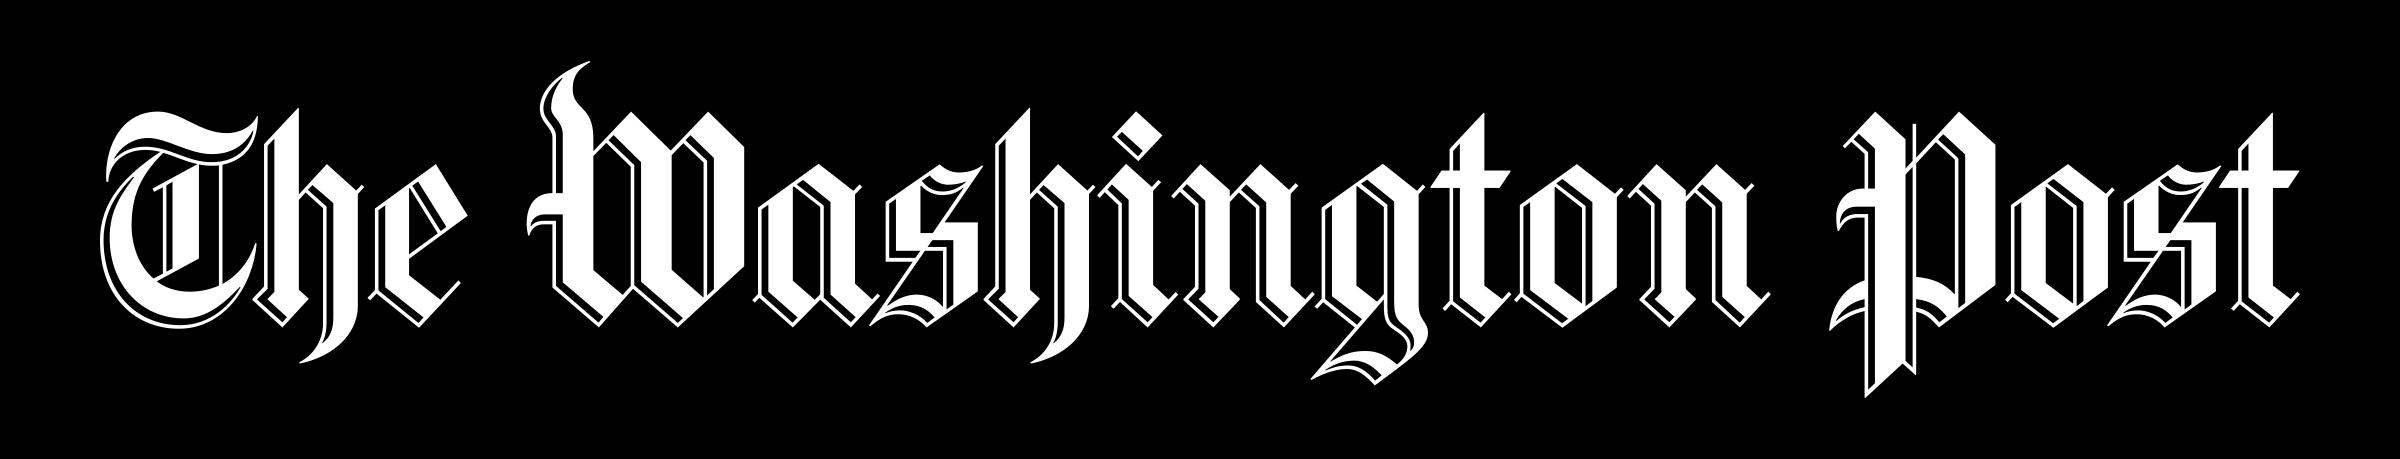 washington-post-logo-white.png?mtime=20180813150256#asset:21268